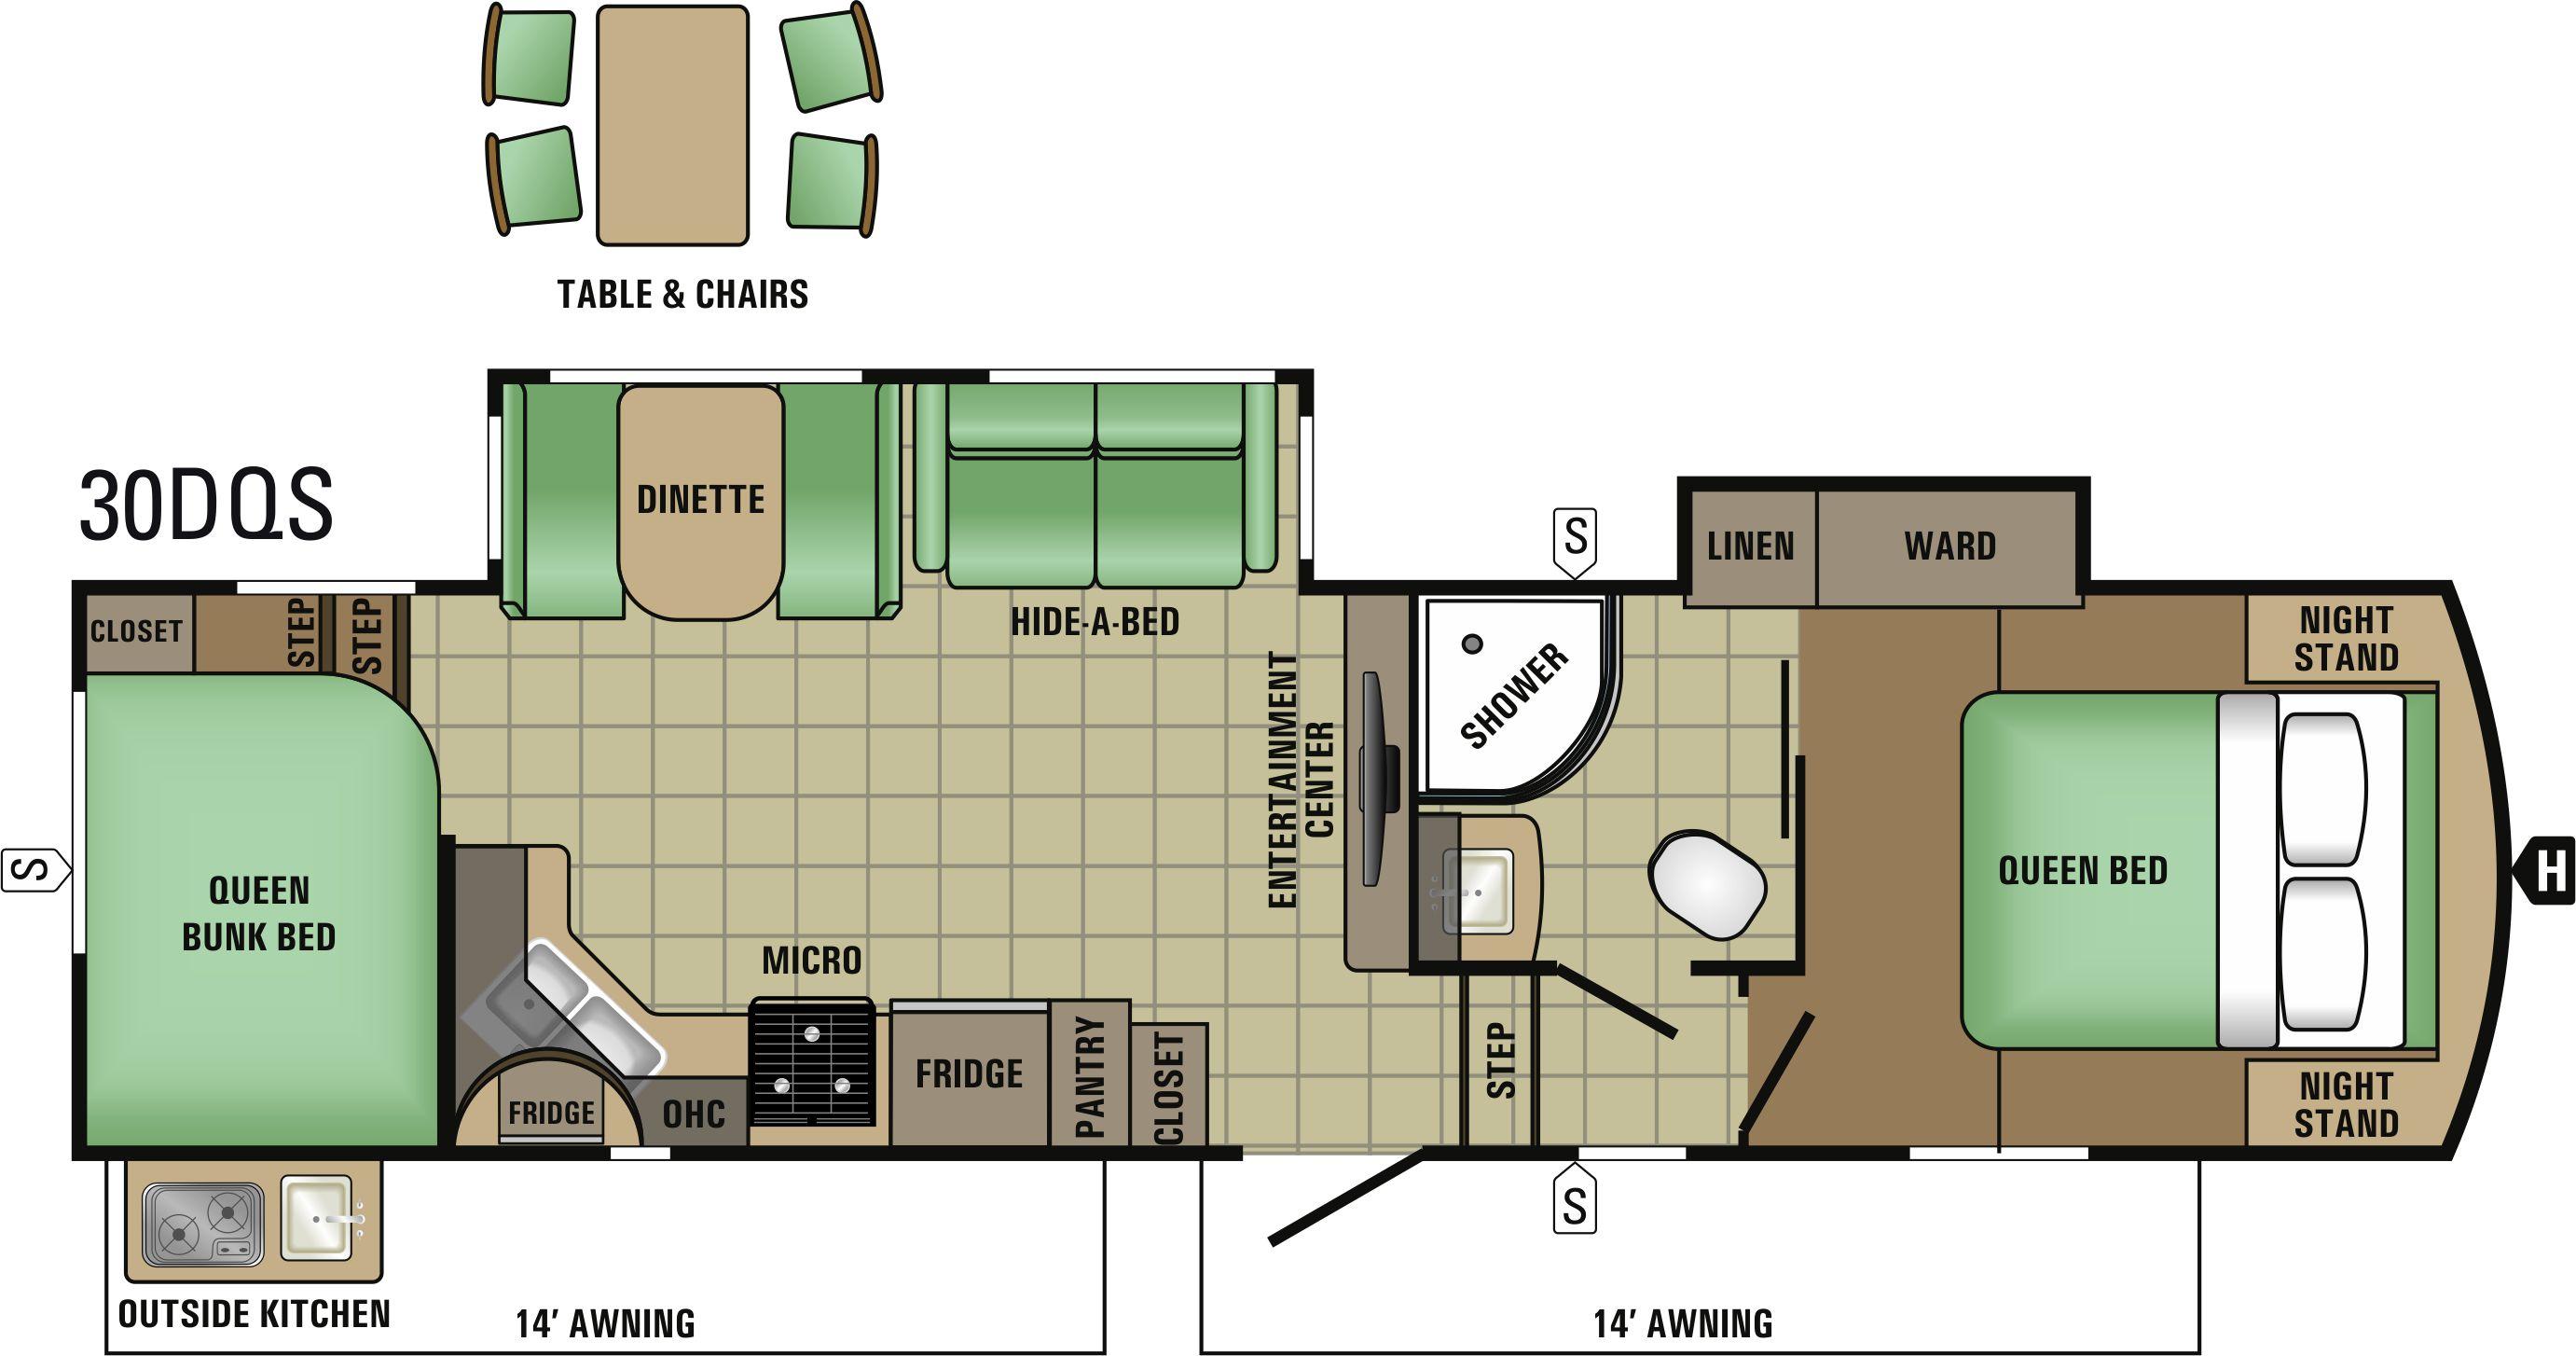 30DQS Floorplan